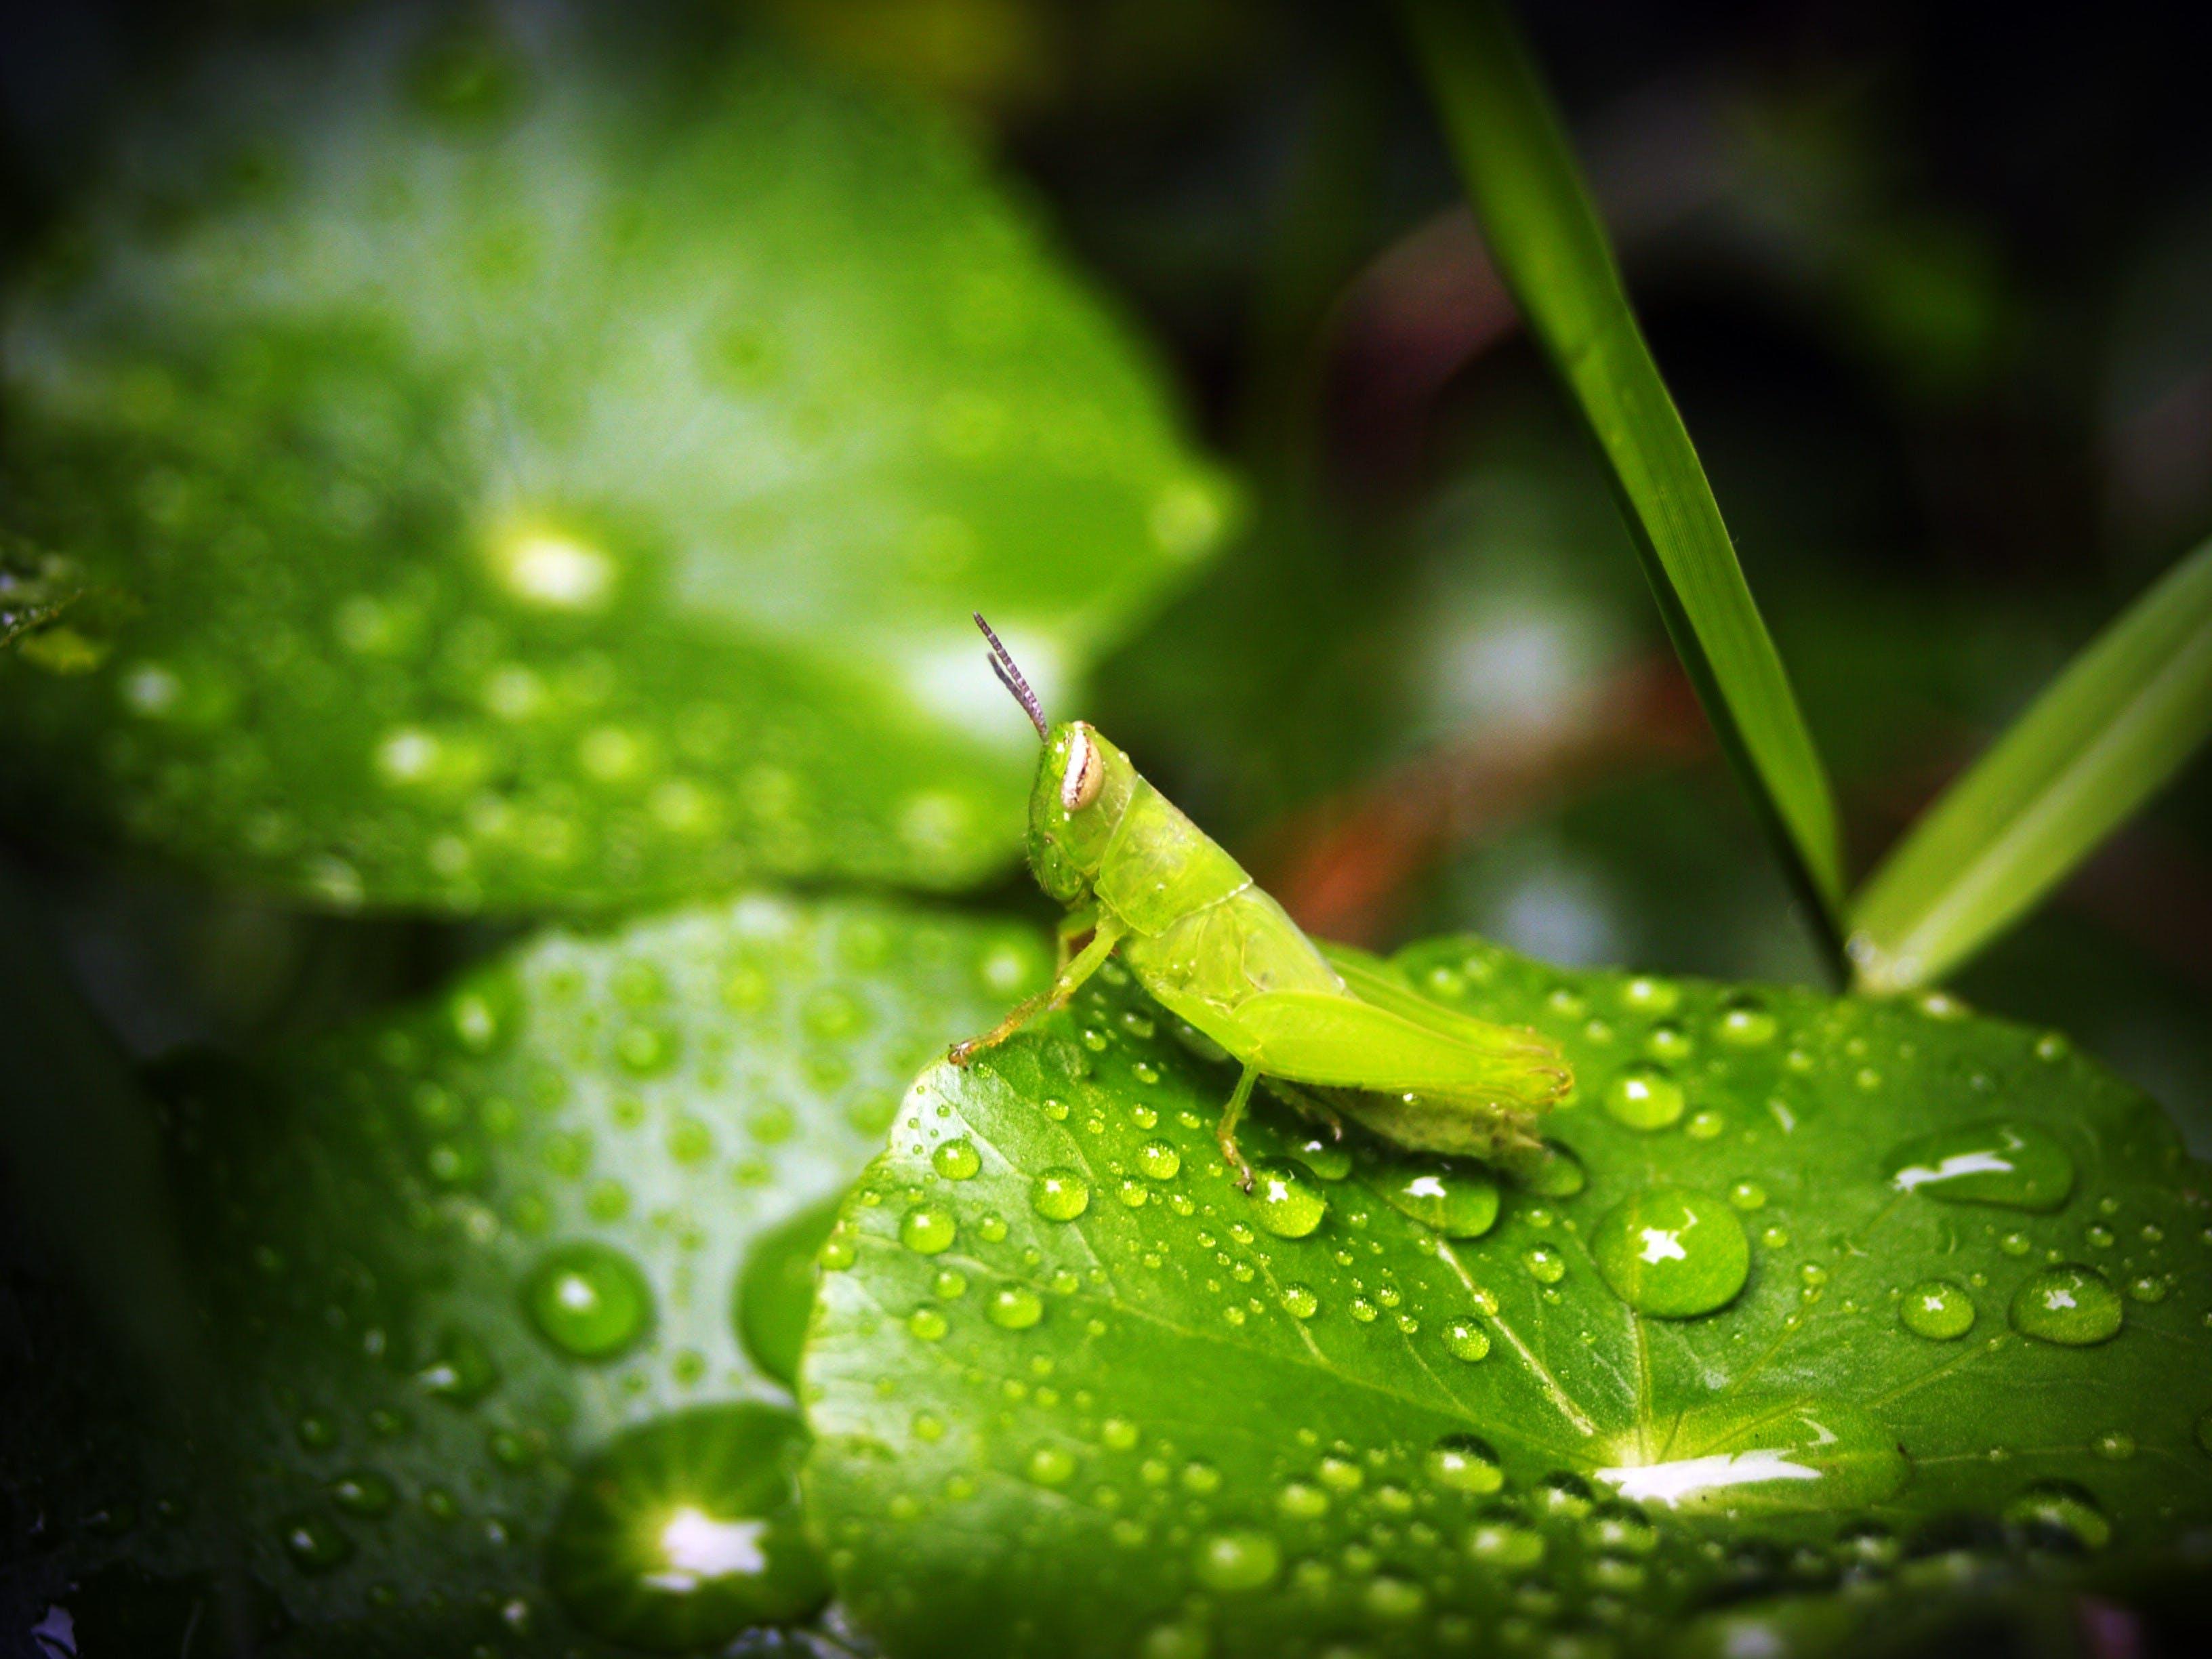 Green Grasshopper on Green Wet Leaf